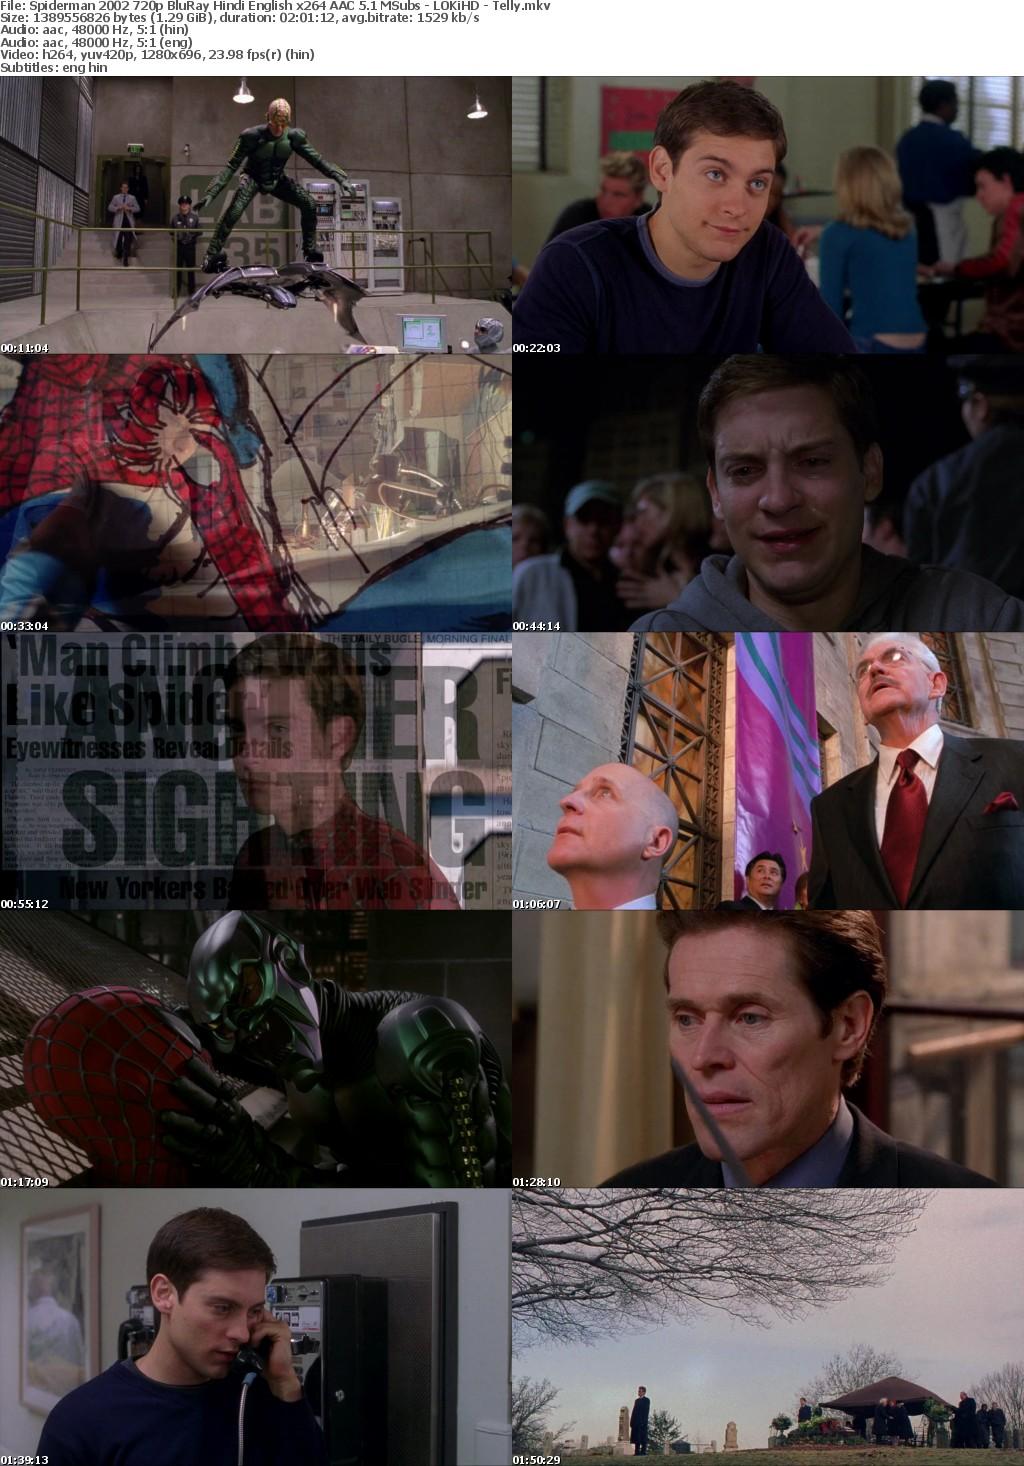 Spiderman (2002) 720p BluRay Hindi English x264 AAC 5.1 MSubs - LOKiHD - Telly